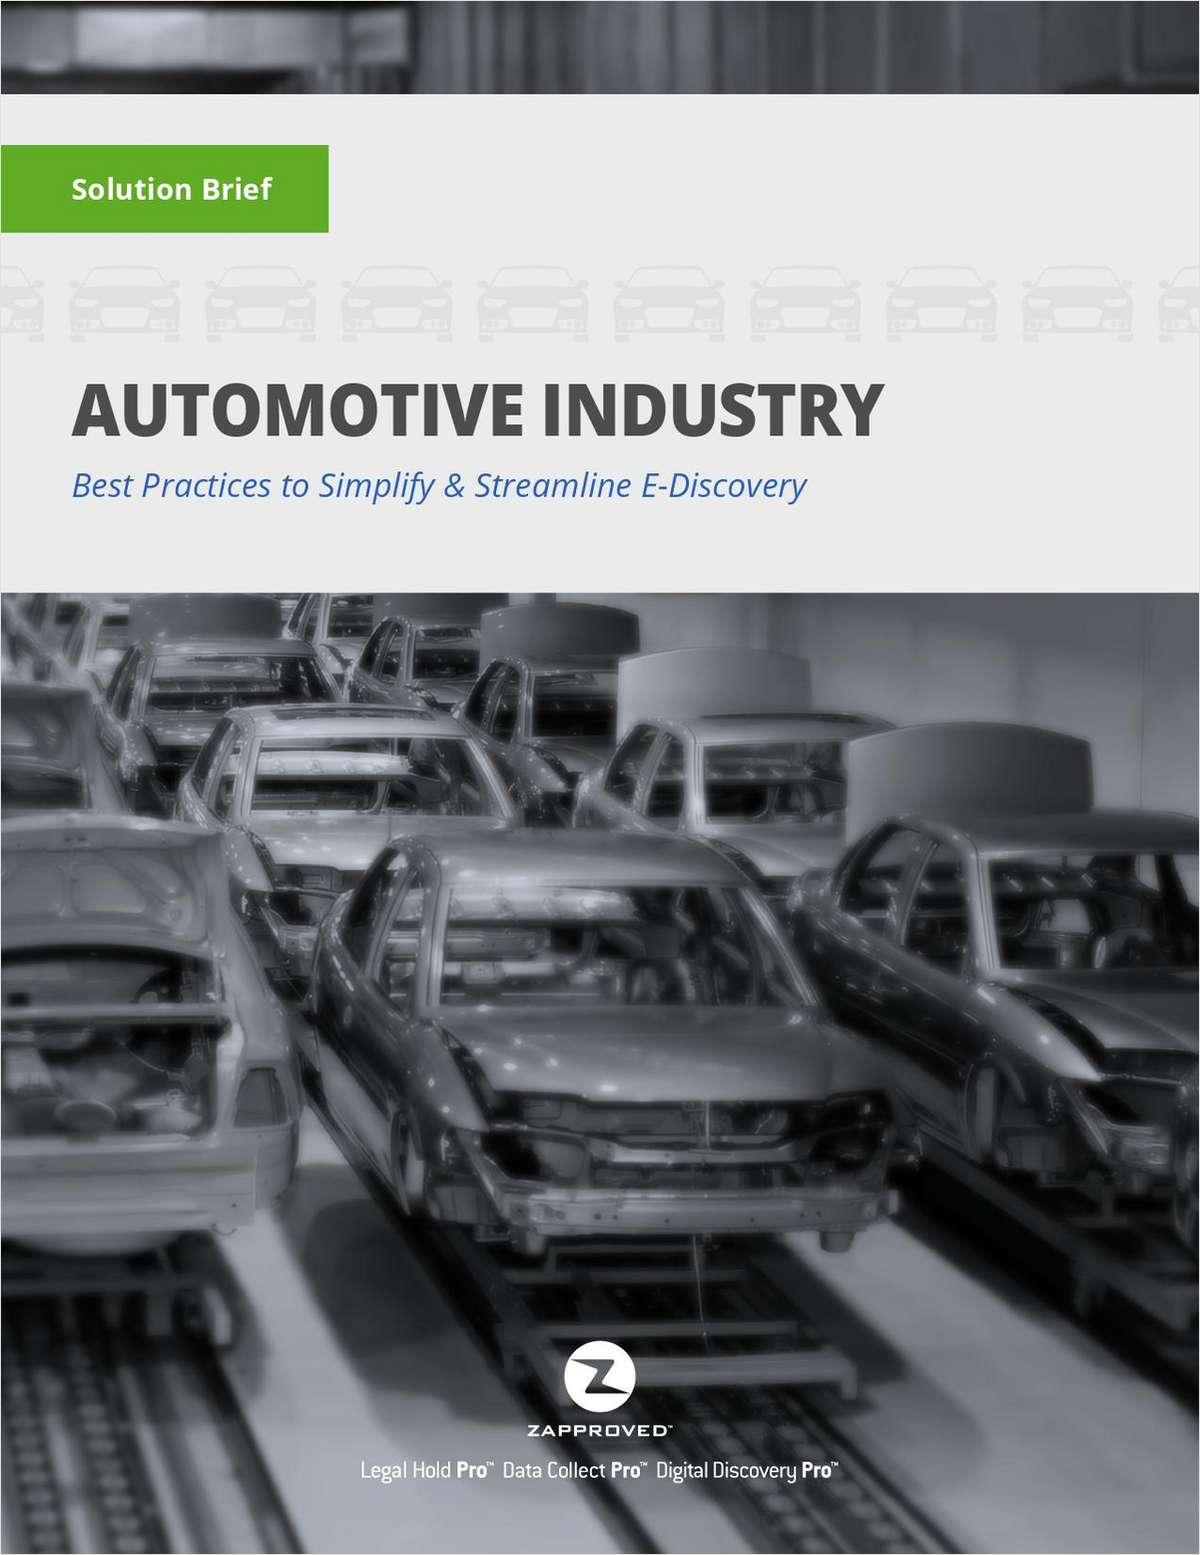 2017 Solution Brief: Automotive Industry